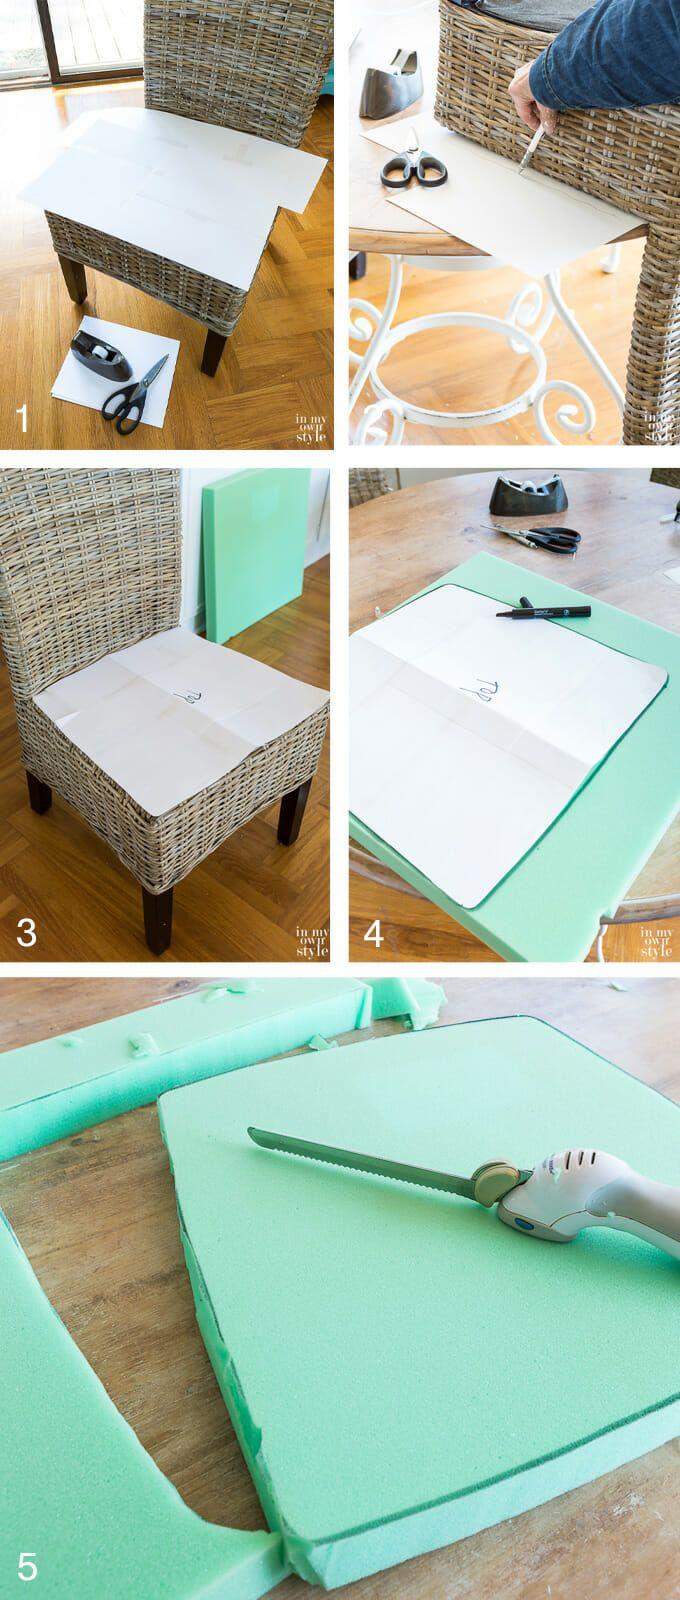 Diy Chair Cushions For My Kitchen Custom Chair Cushion Dining Room Chair Cushions Dining Chairs Diy